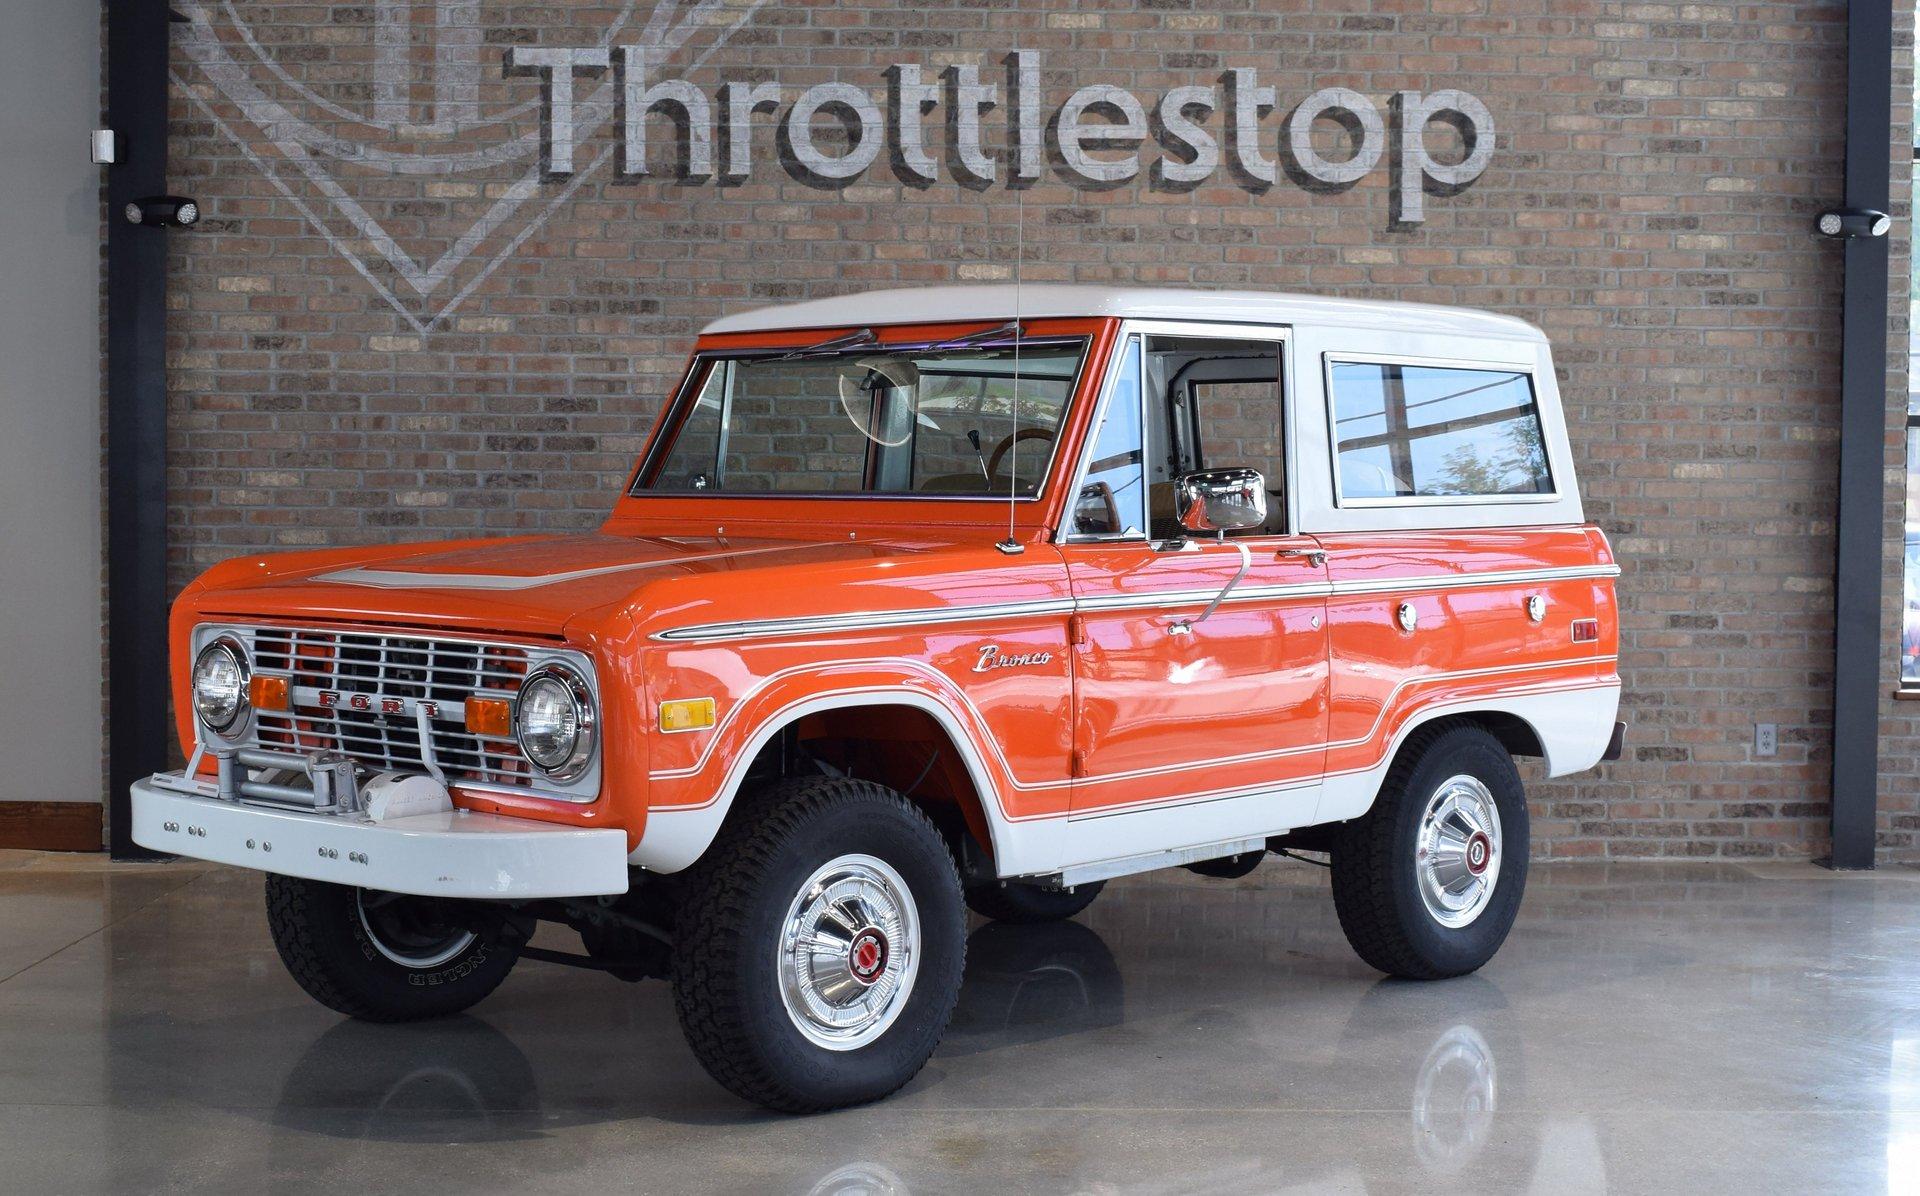 1976 ford bronco 4x4 ranger edition